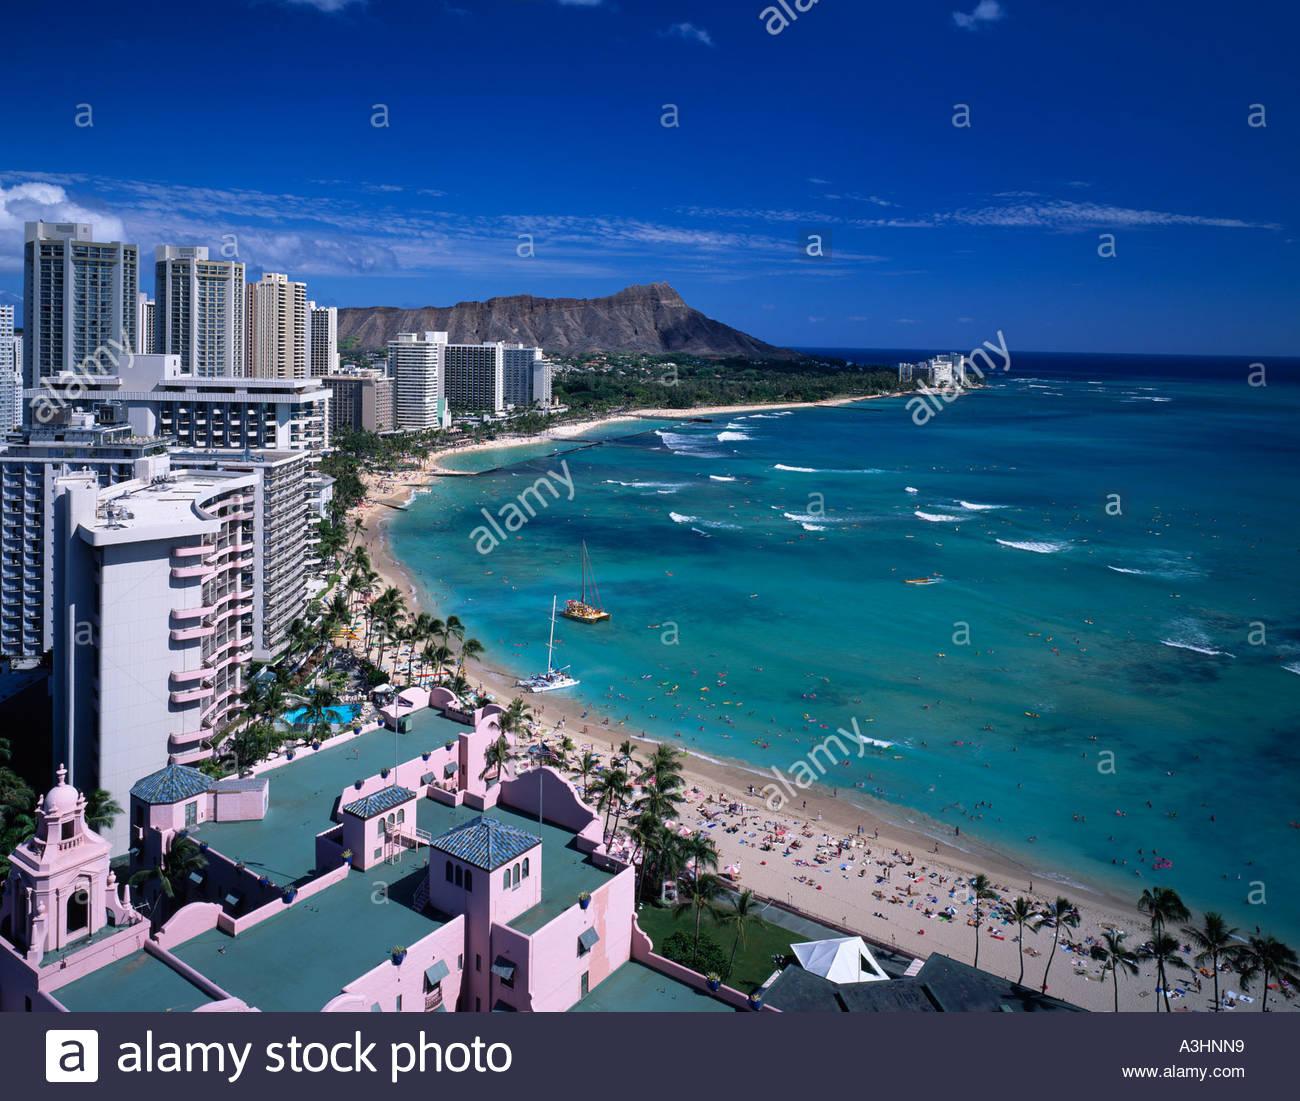 waikiki beach diamond head sheraton hotels resorts waikiki oahu hawaii sightseeing sea wave sandy beach - Oahu Hotels And Resorts